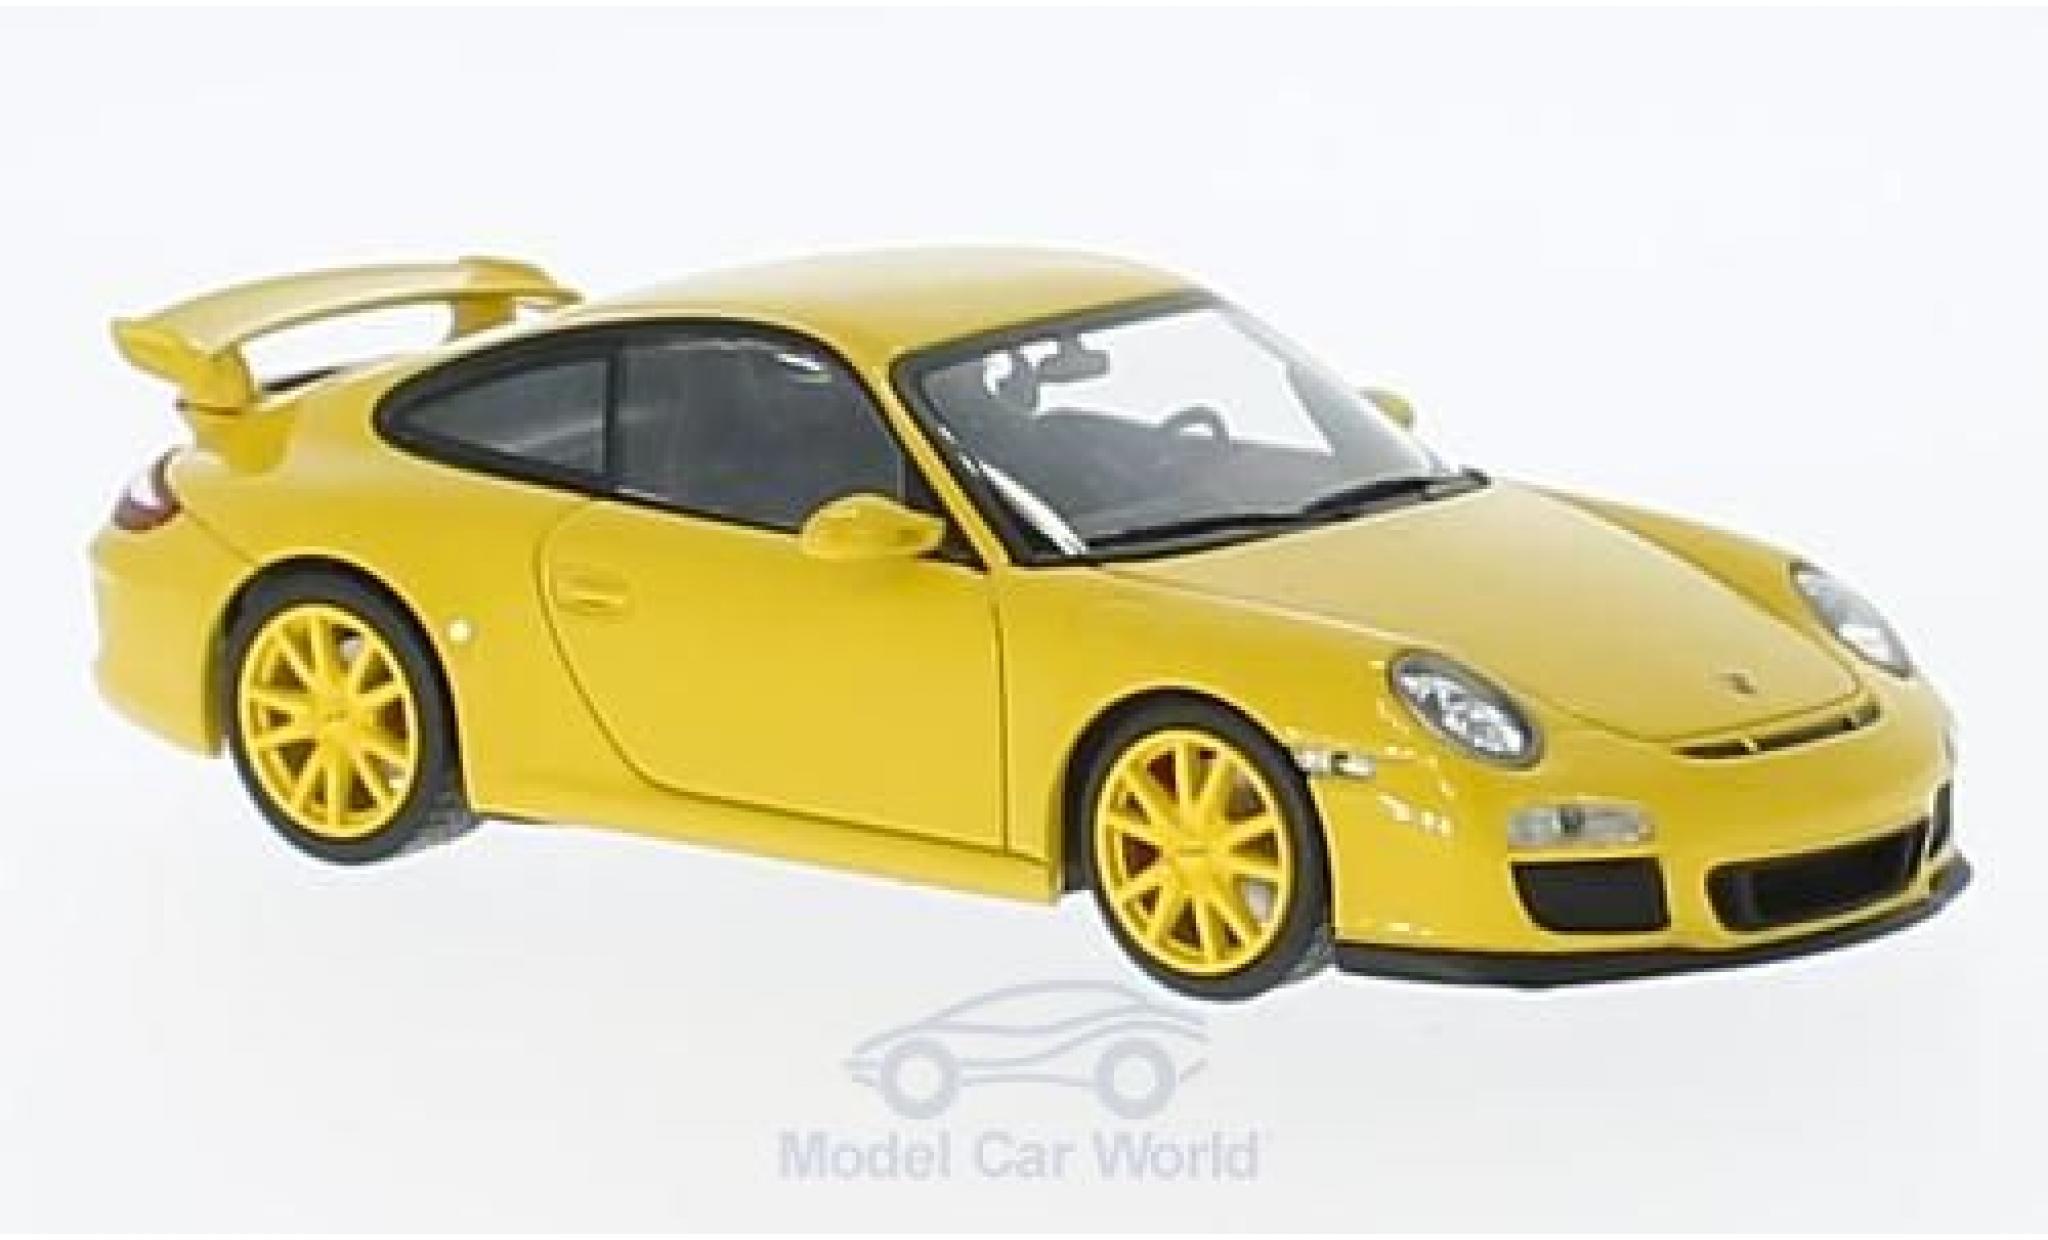 Porsche 997 SC 1/43 Minichamps GT3 jaune 2009 mit jauneen Felgen